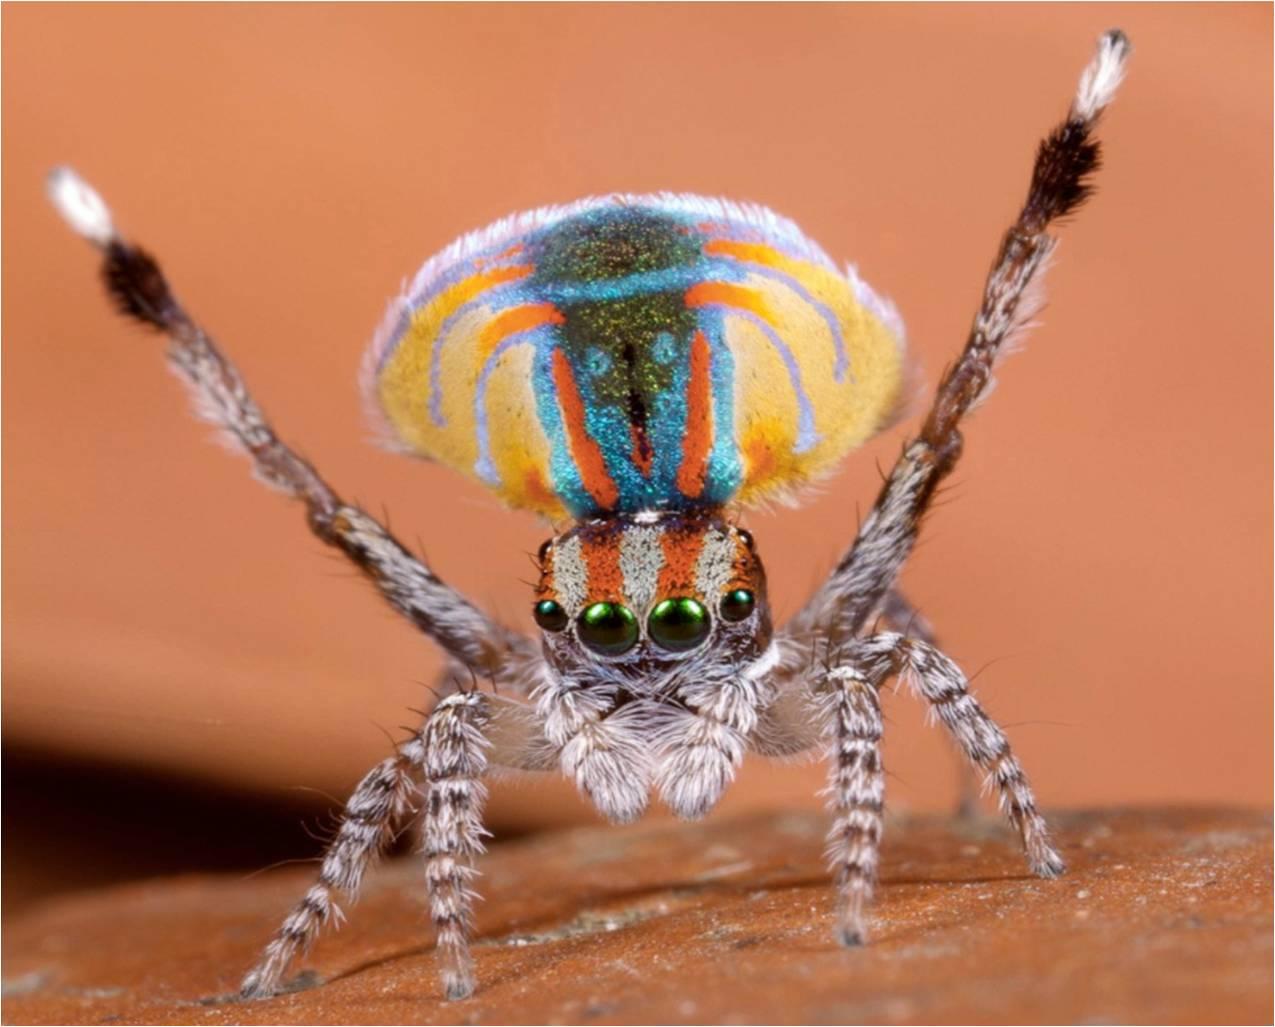 Peacock spider dance - photo#6